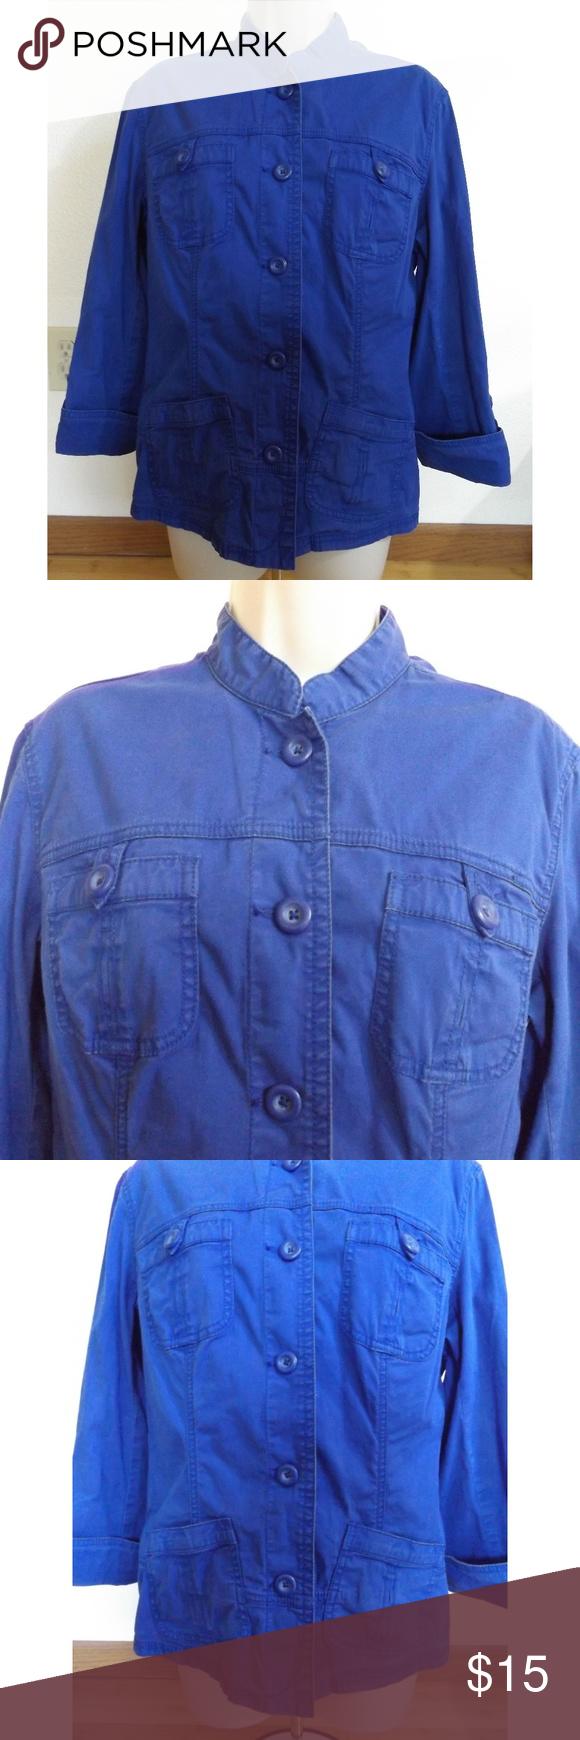 Chico S Size 1 Denim Jacket Chico S Size 1 Royal Blue Denim Jacket Color Look Brighter In Picture Than In Person Denim Jacket Clothes Design Blue Denim Jacket [ 1740 x 580 Pixel ]